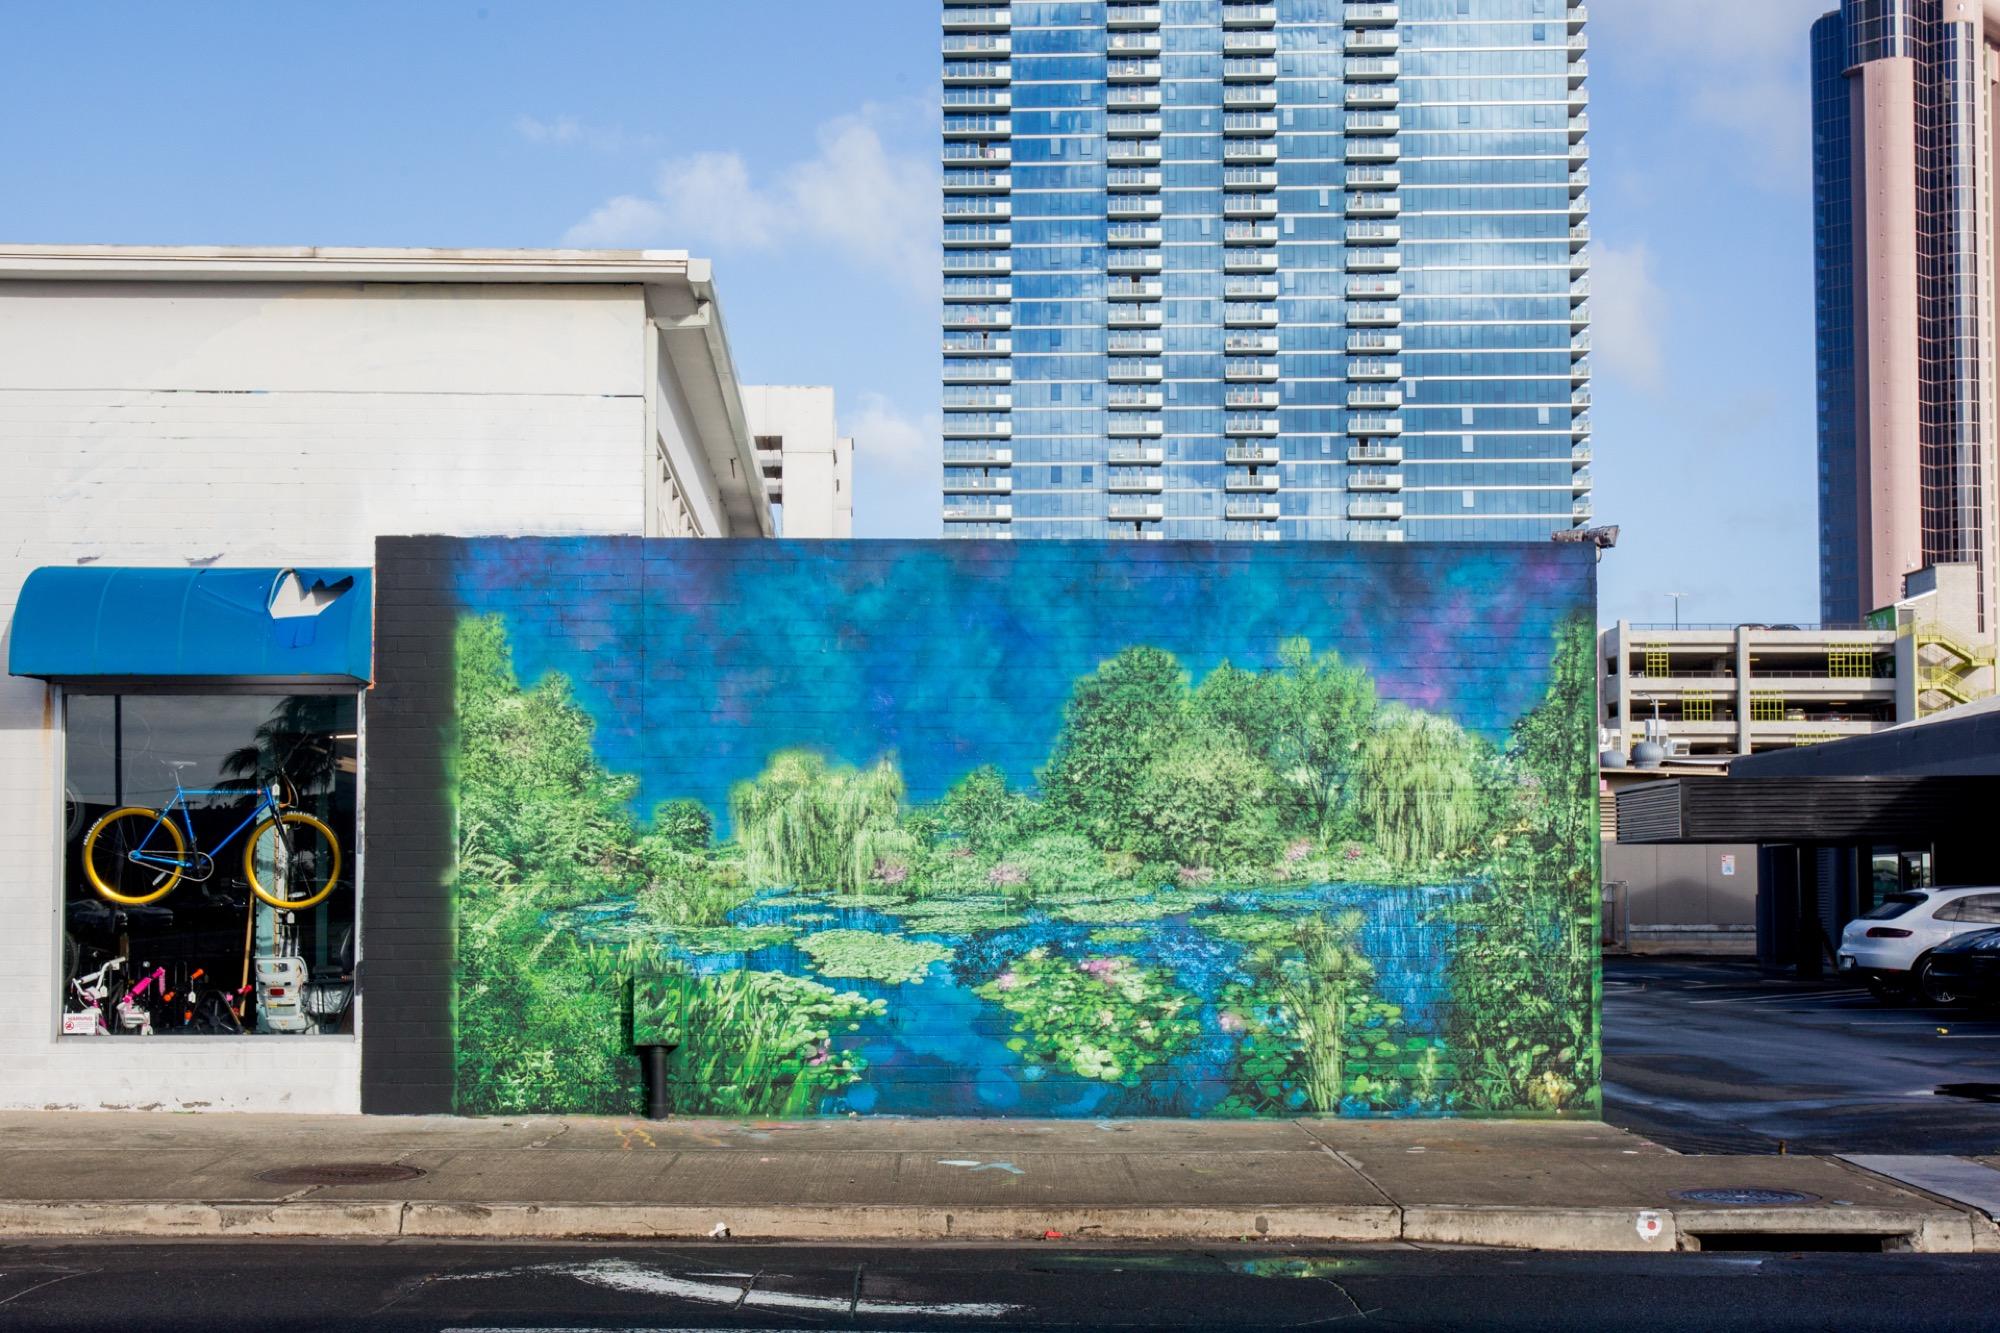 Recap: POW! WOW! Hawaii 2019 Artes & contextos pwh2019 LoganHicks 01 lannycatcheswalls